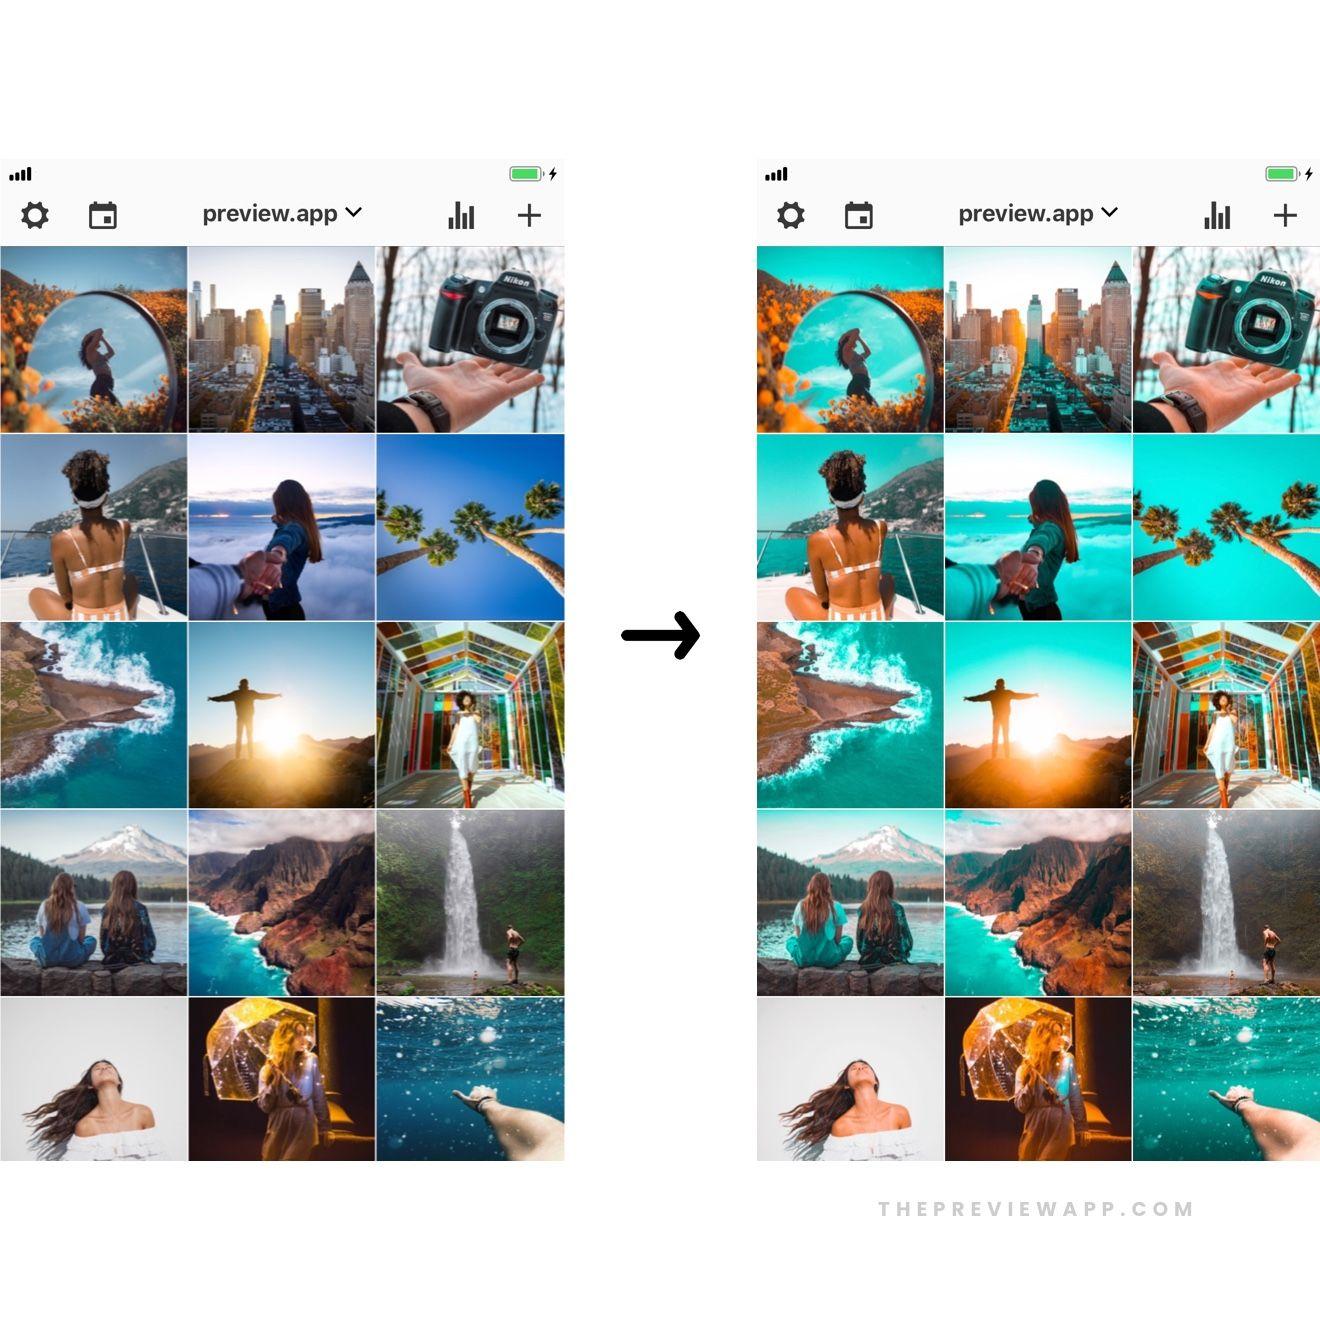 Instagram Filters APP ? big Instagrammers use! Filters